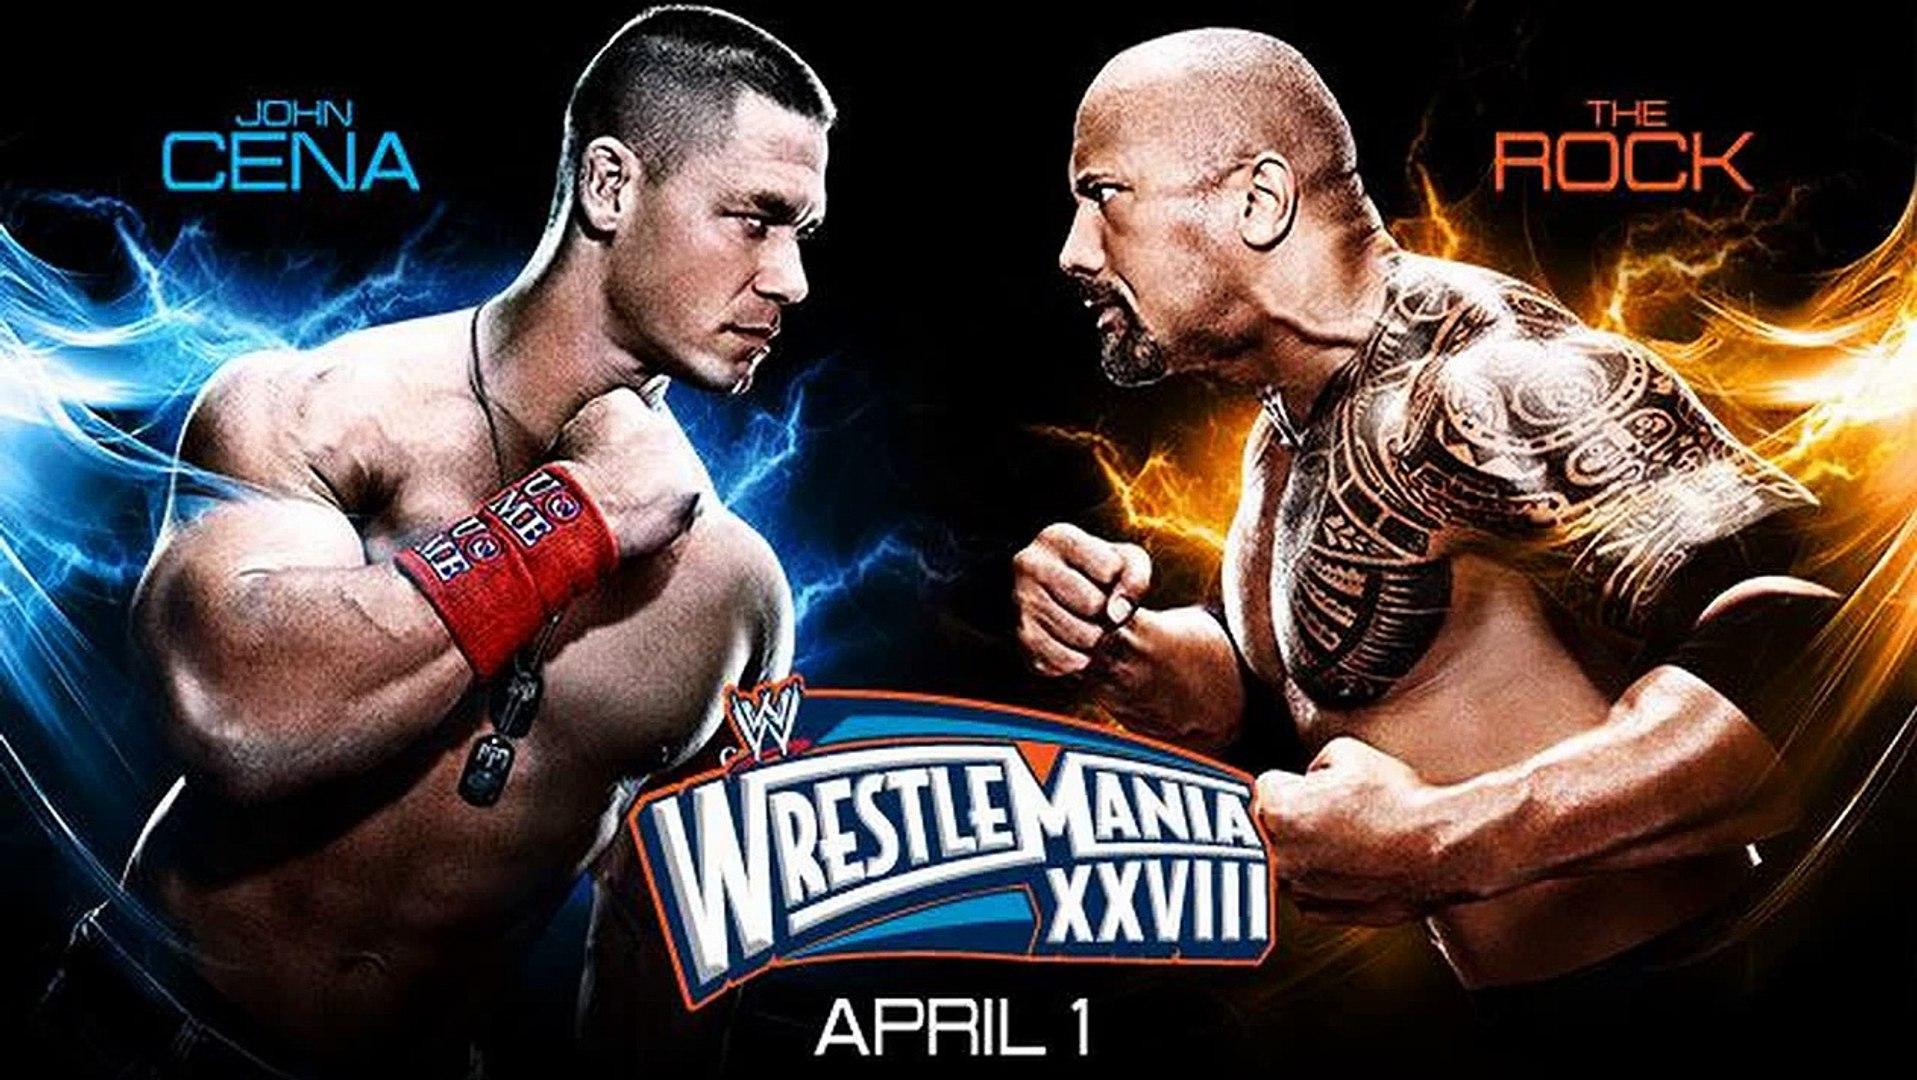 WWE: Wrestlemania 28 Match Card: The Rock vs. John Cena ...